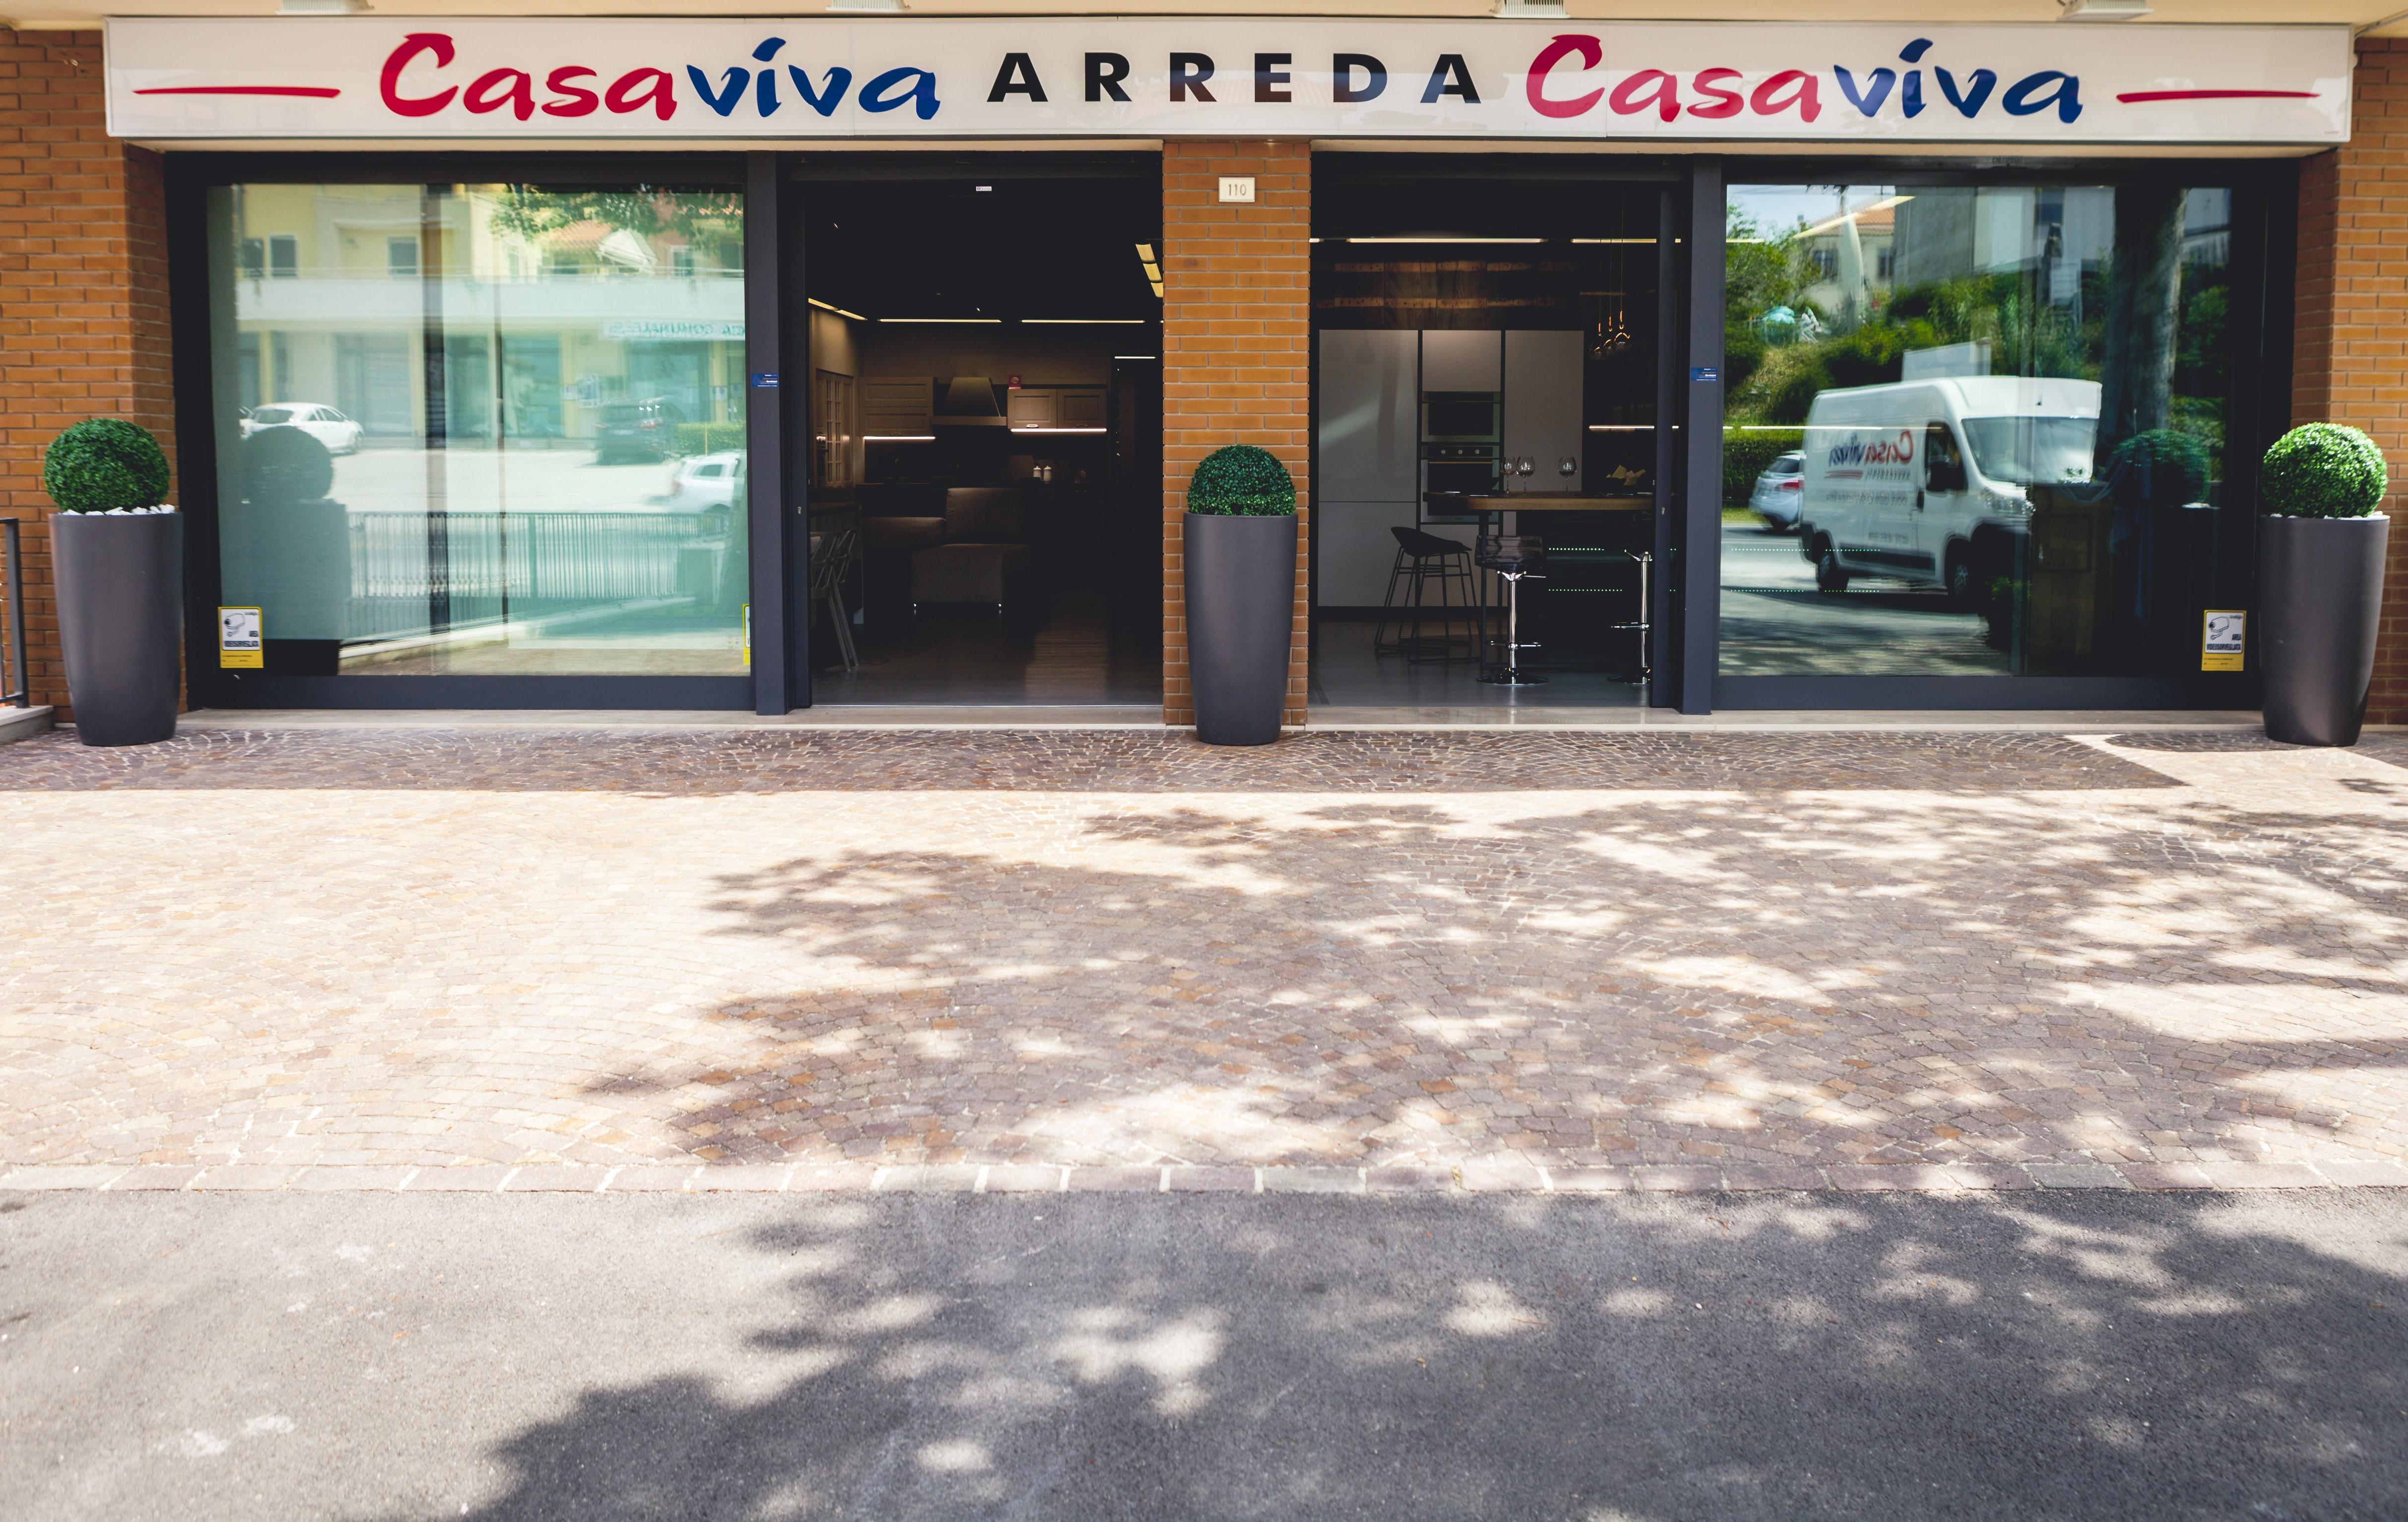 Arredamento d'interni Casa Viva Arreda